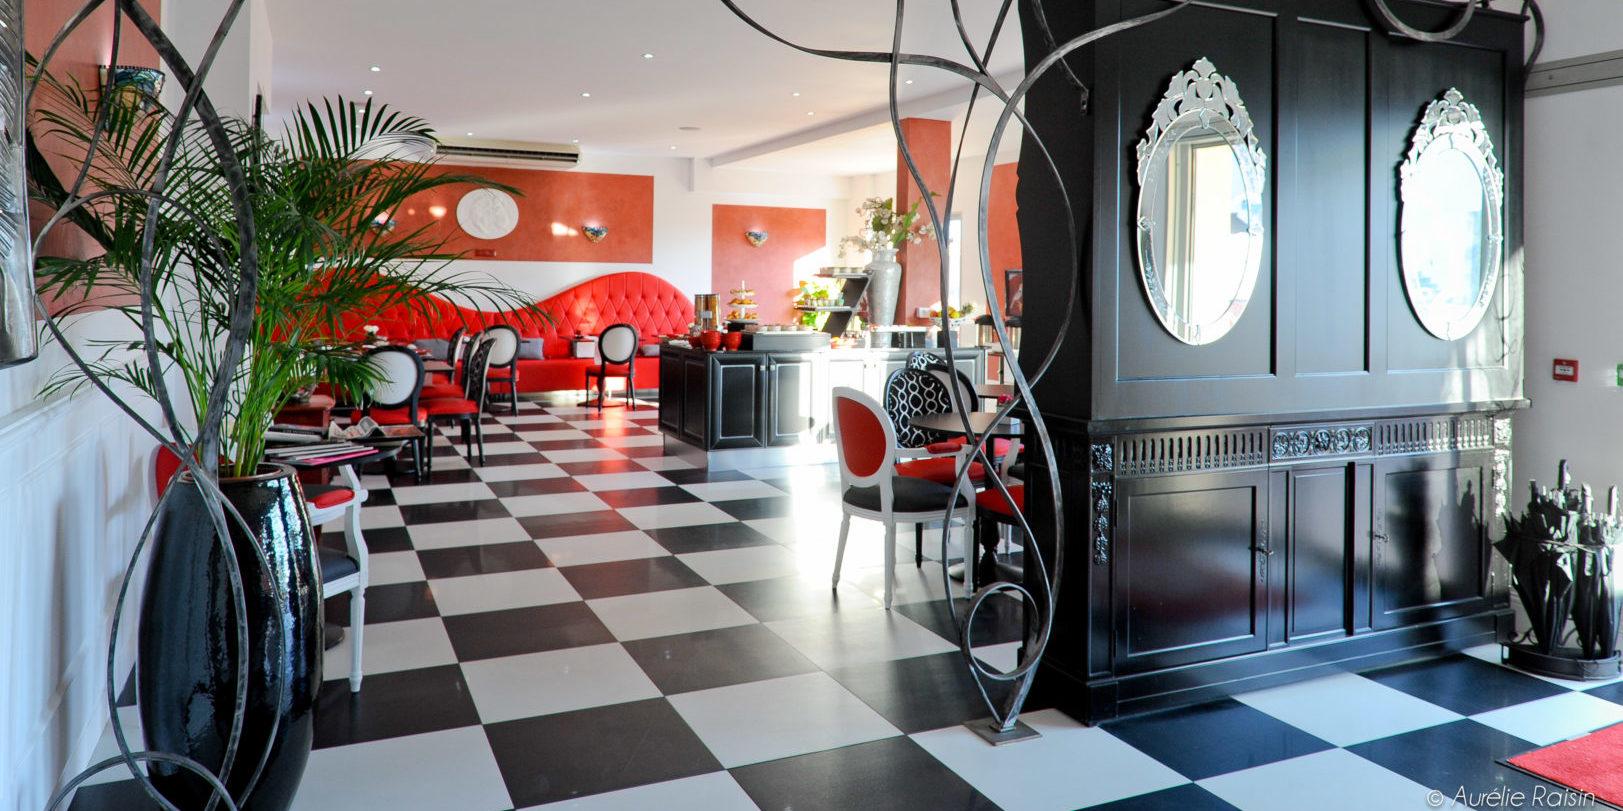 Boutique Hotel Liberata Ile Rousse Balagne Corsica Frankrijk art nouveau lobby lounge kunstobjecten